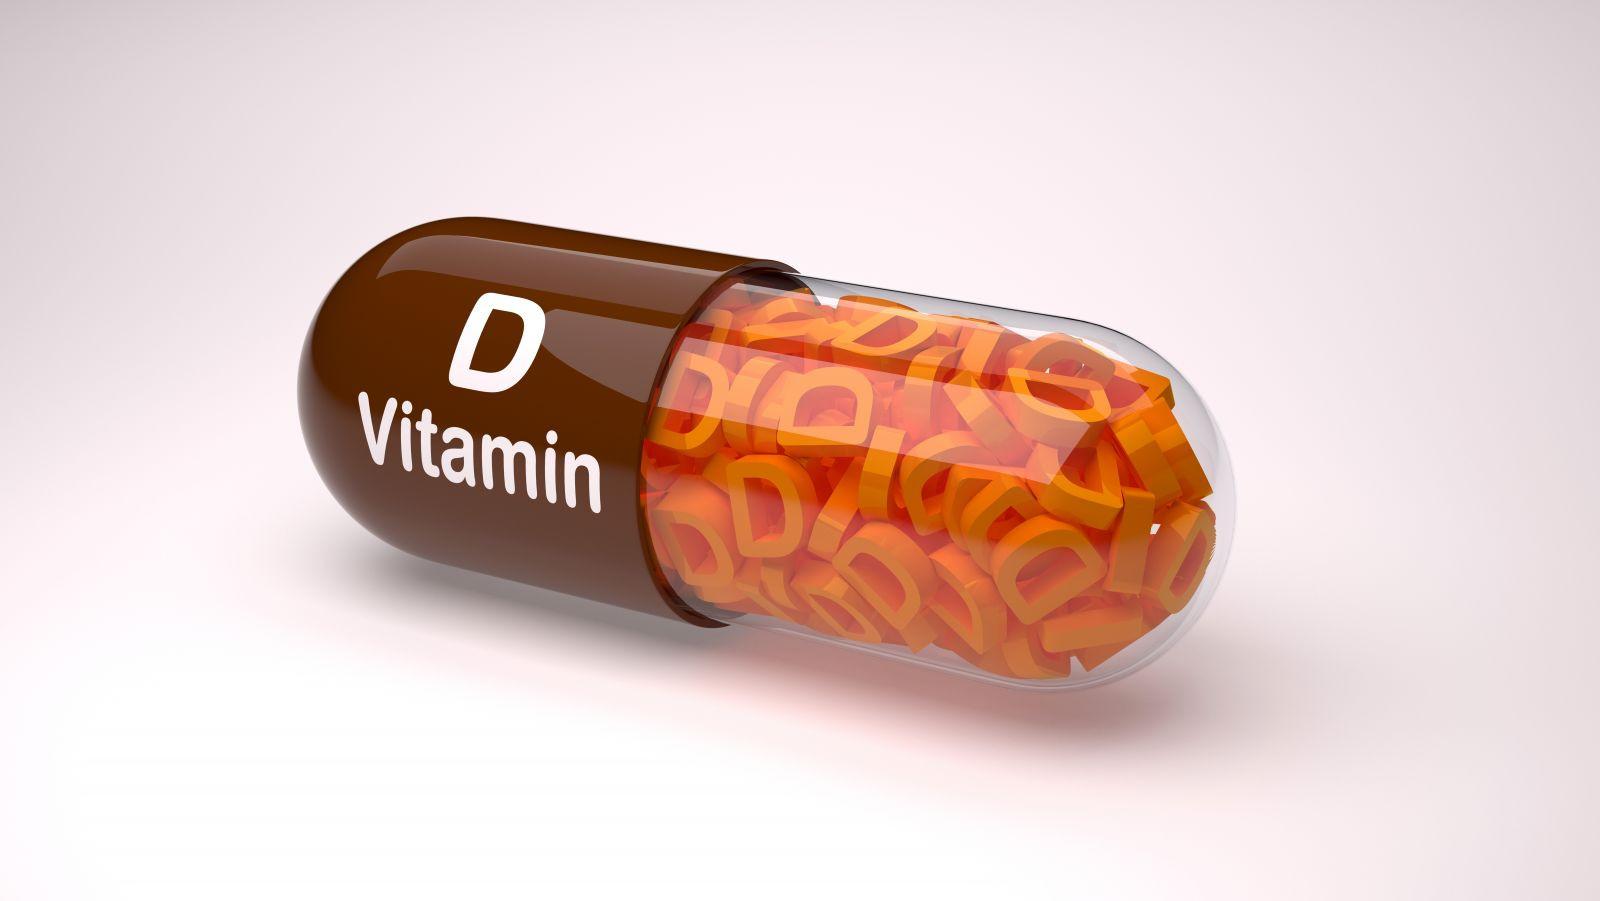 hb-vitamins-01162072646615